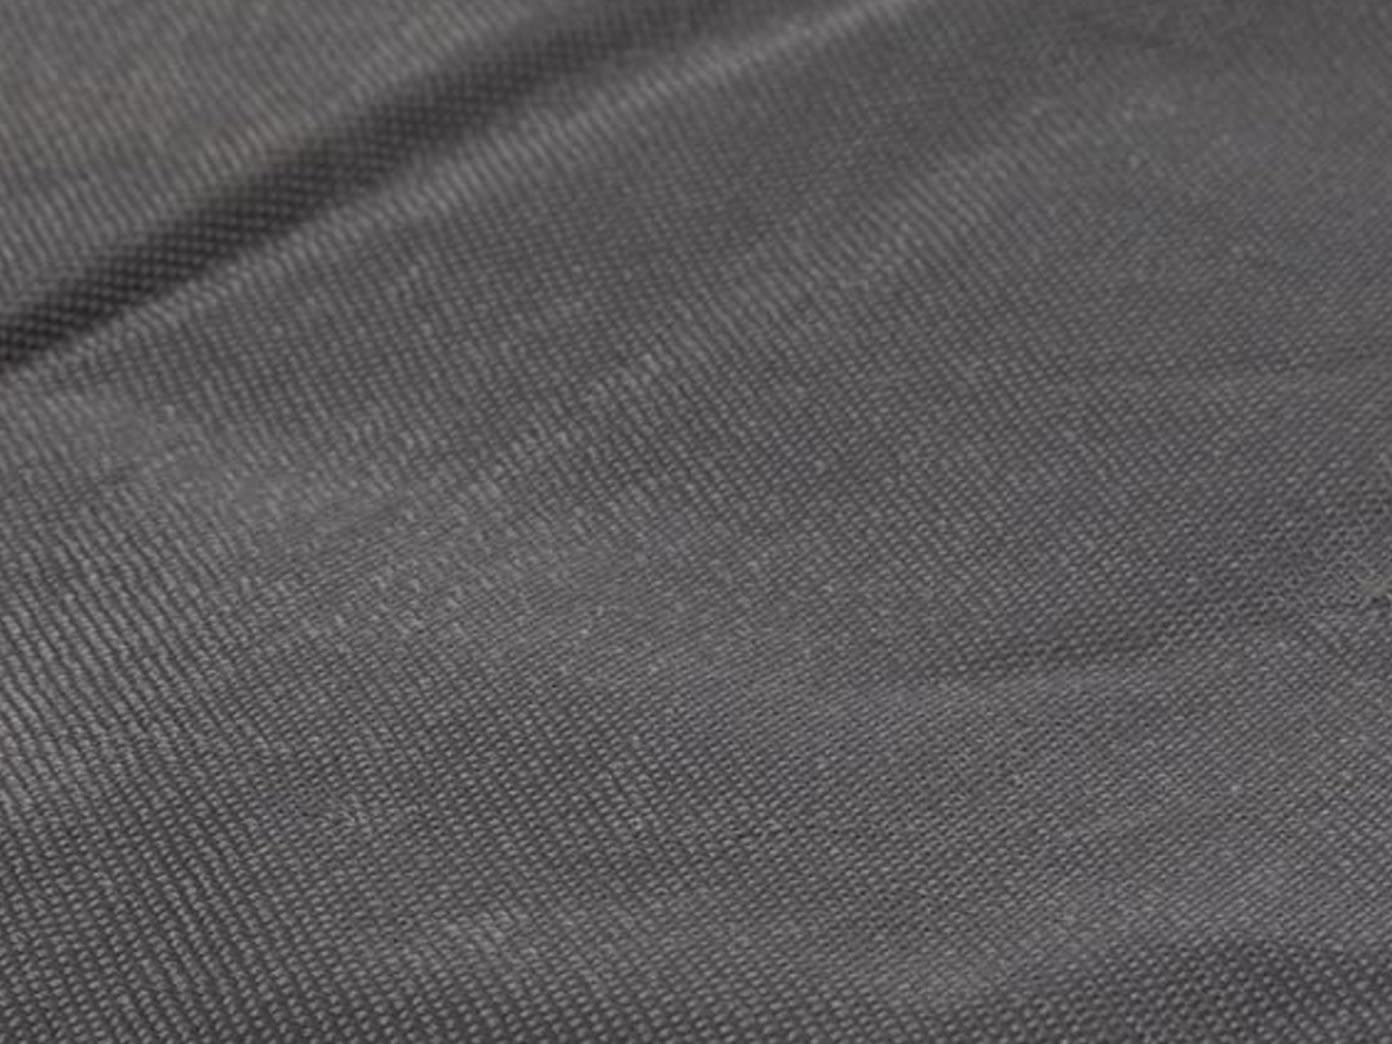 Noir Perel Garden oclc Coque pour Tabouret 95/x 95/x 70/cm